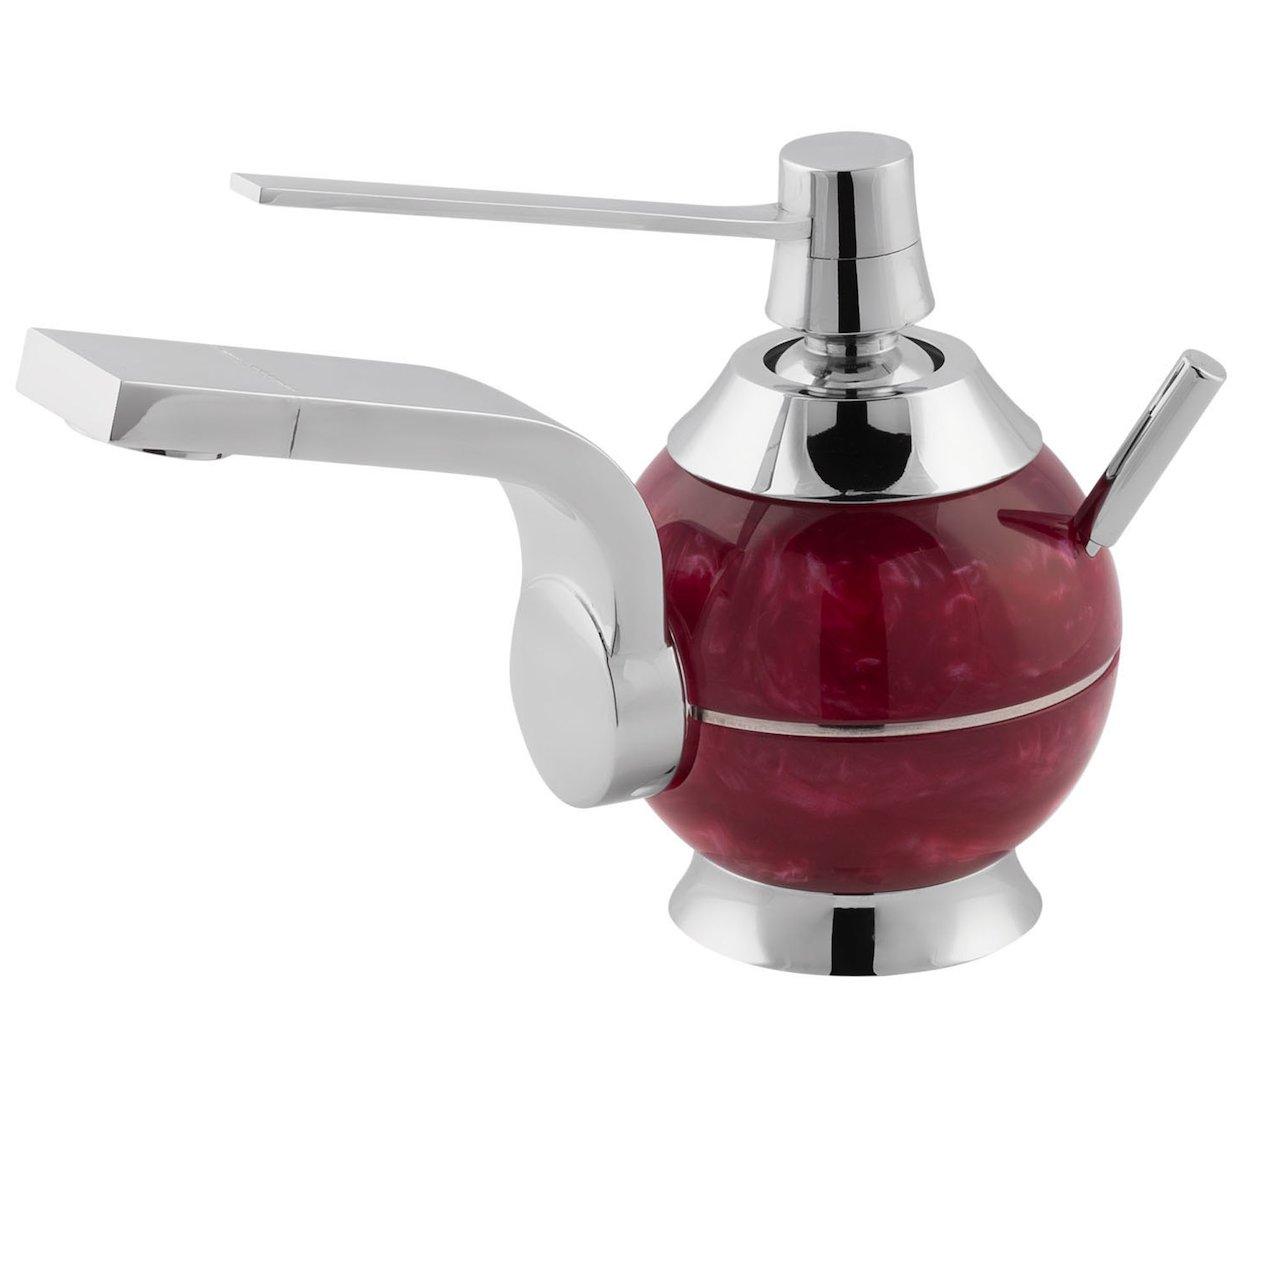 Basin mixer Perle red